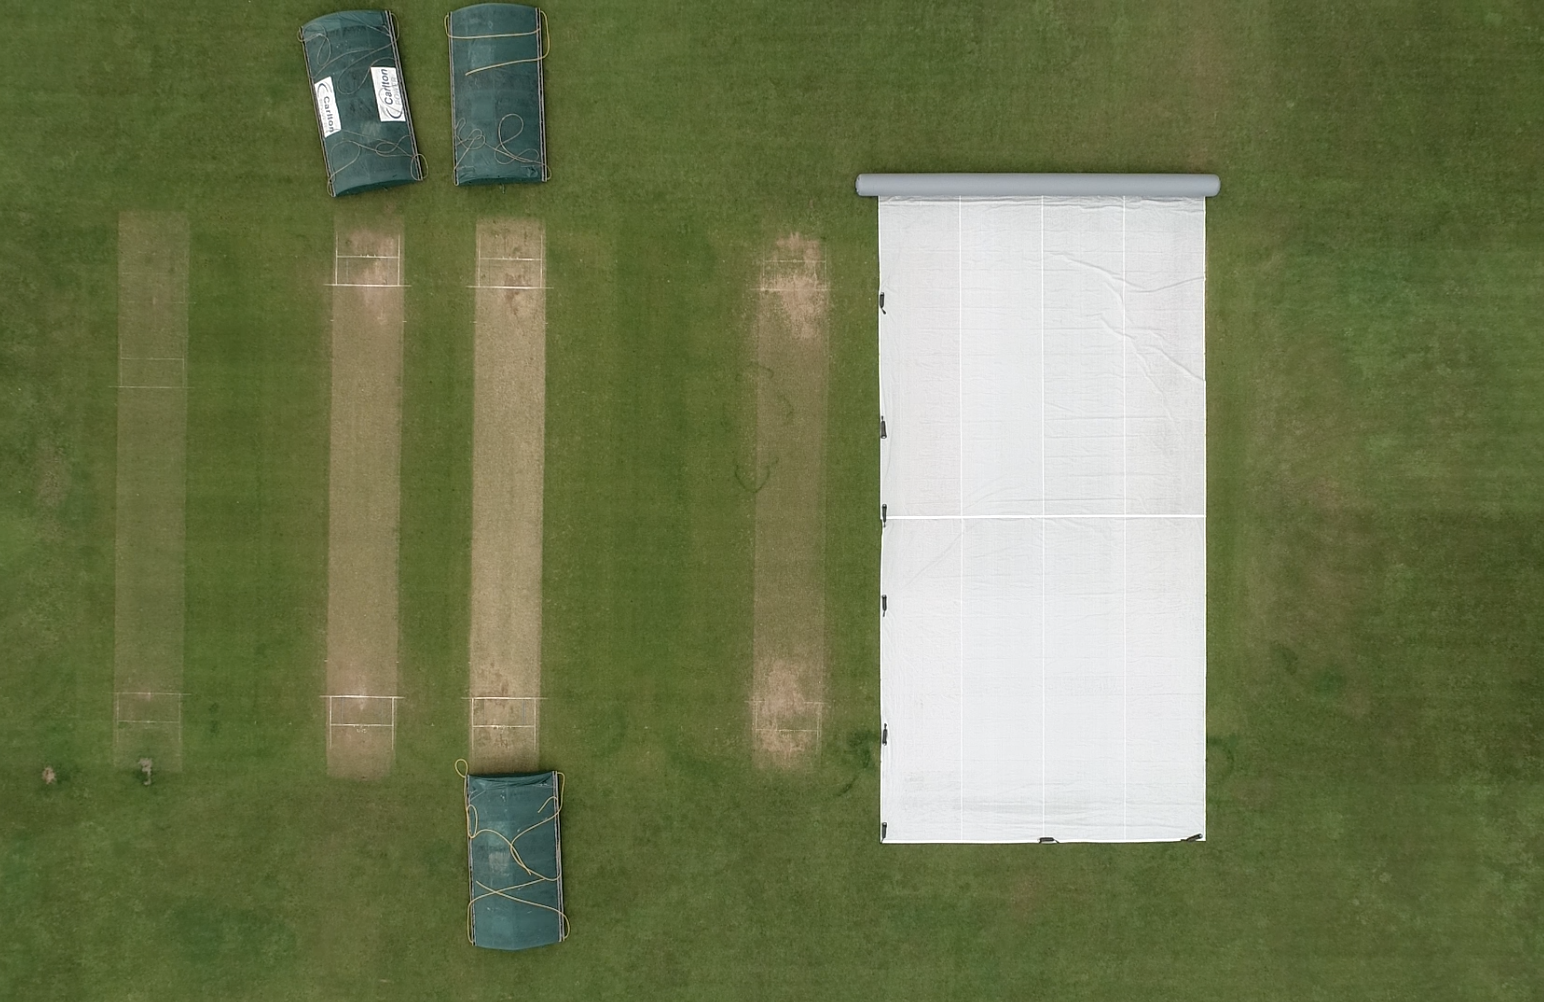 Cricket over shot 2